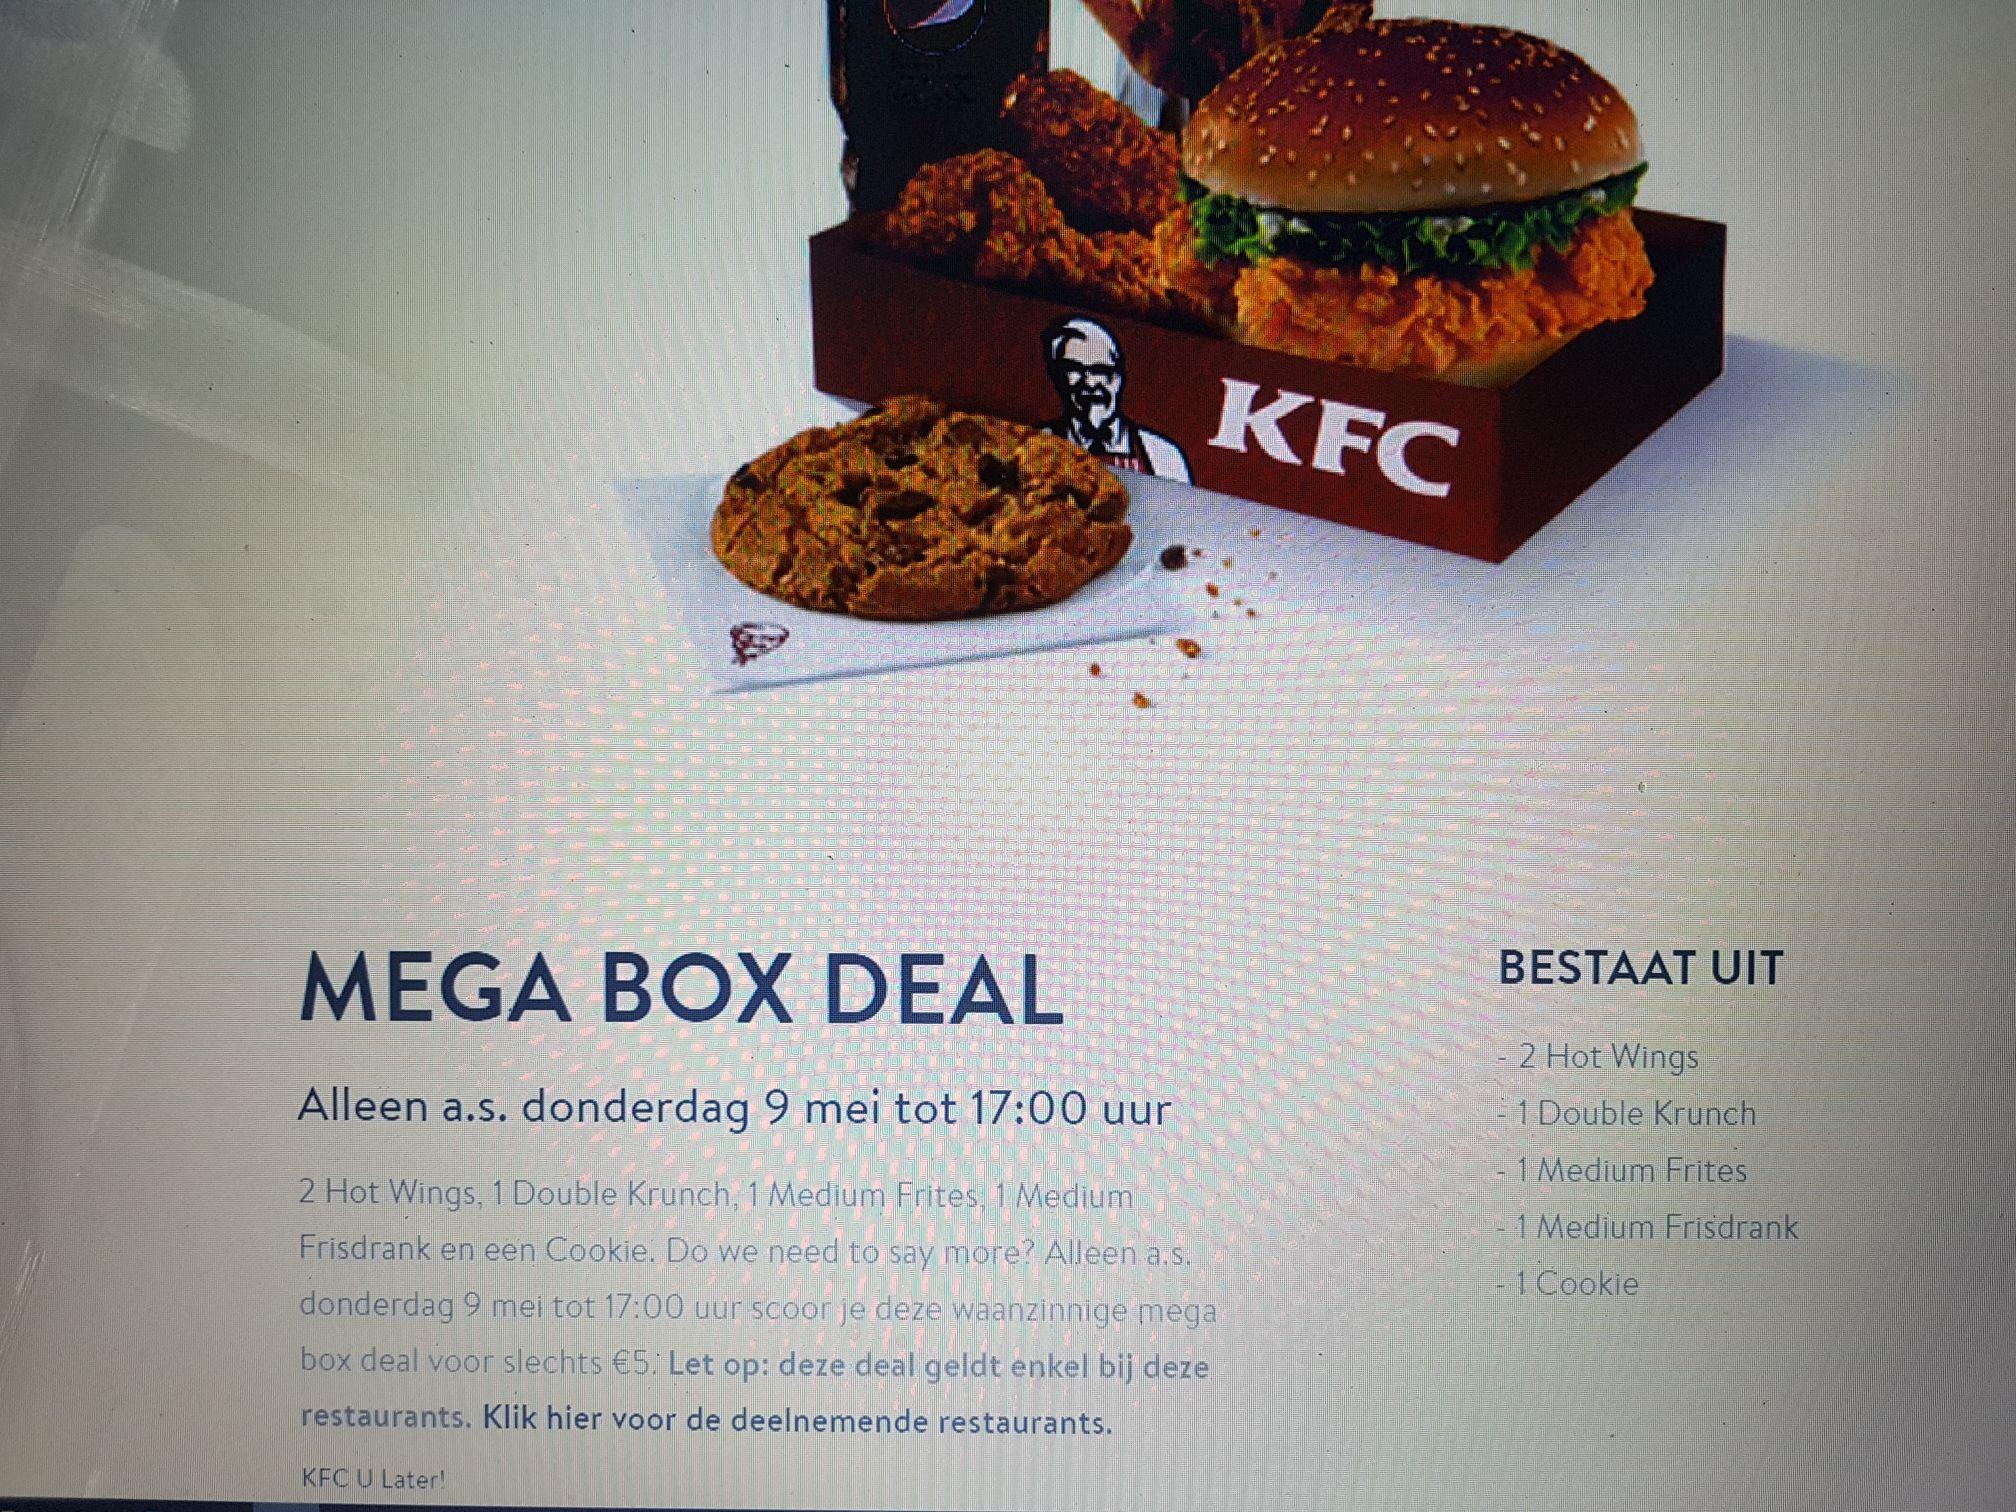 [Lokaal!] Kfc mega box deal. Alleen a.s. donderdag 9 mei